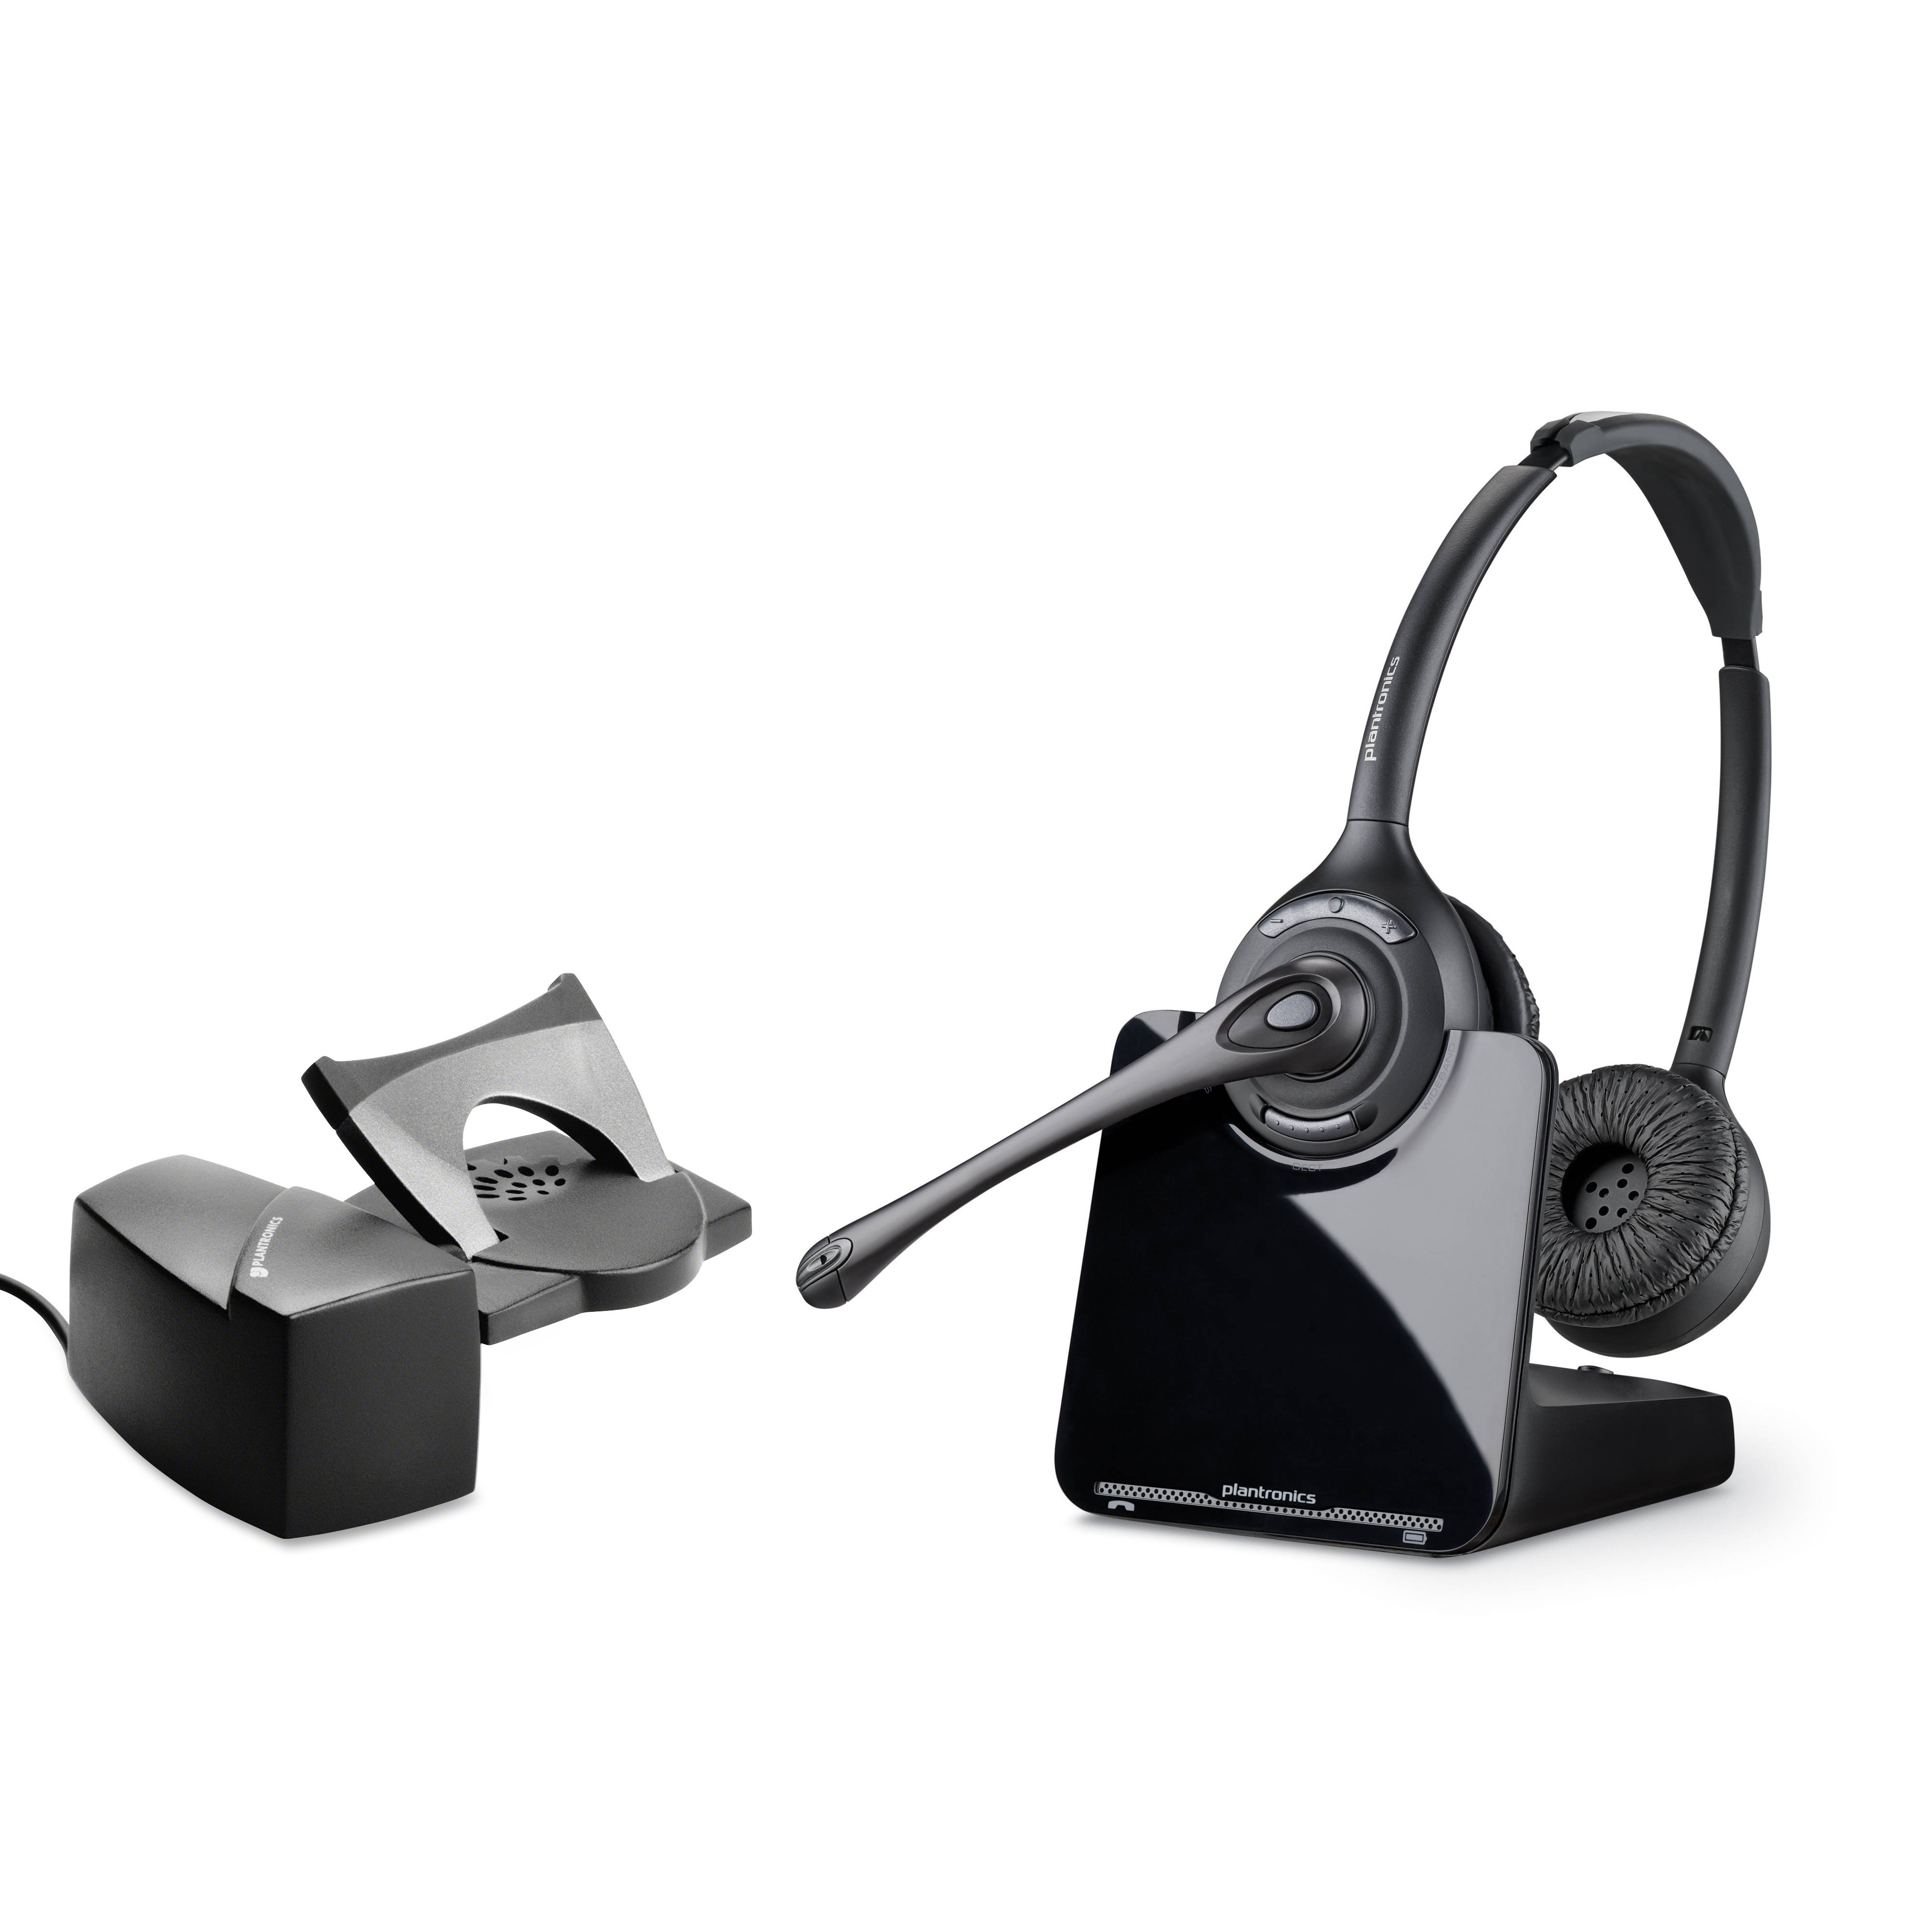 Plantronics CS520 Binaural DECT Cordless Headset & Handset Lifter